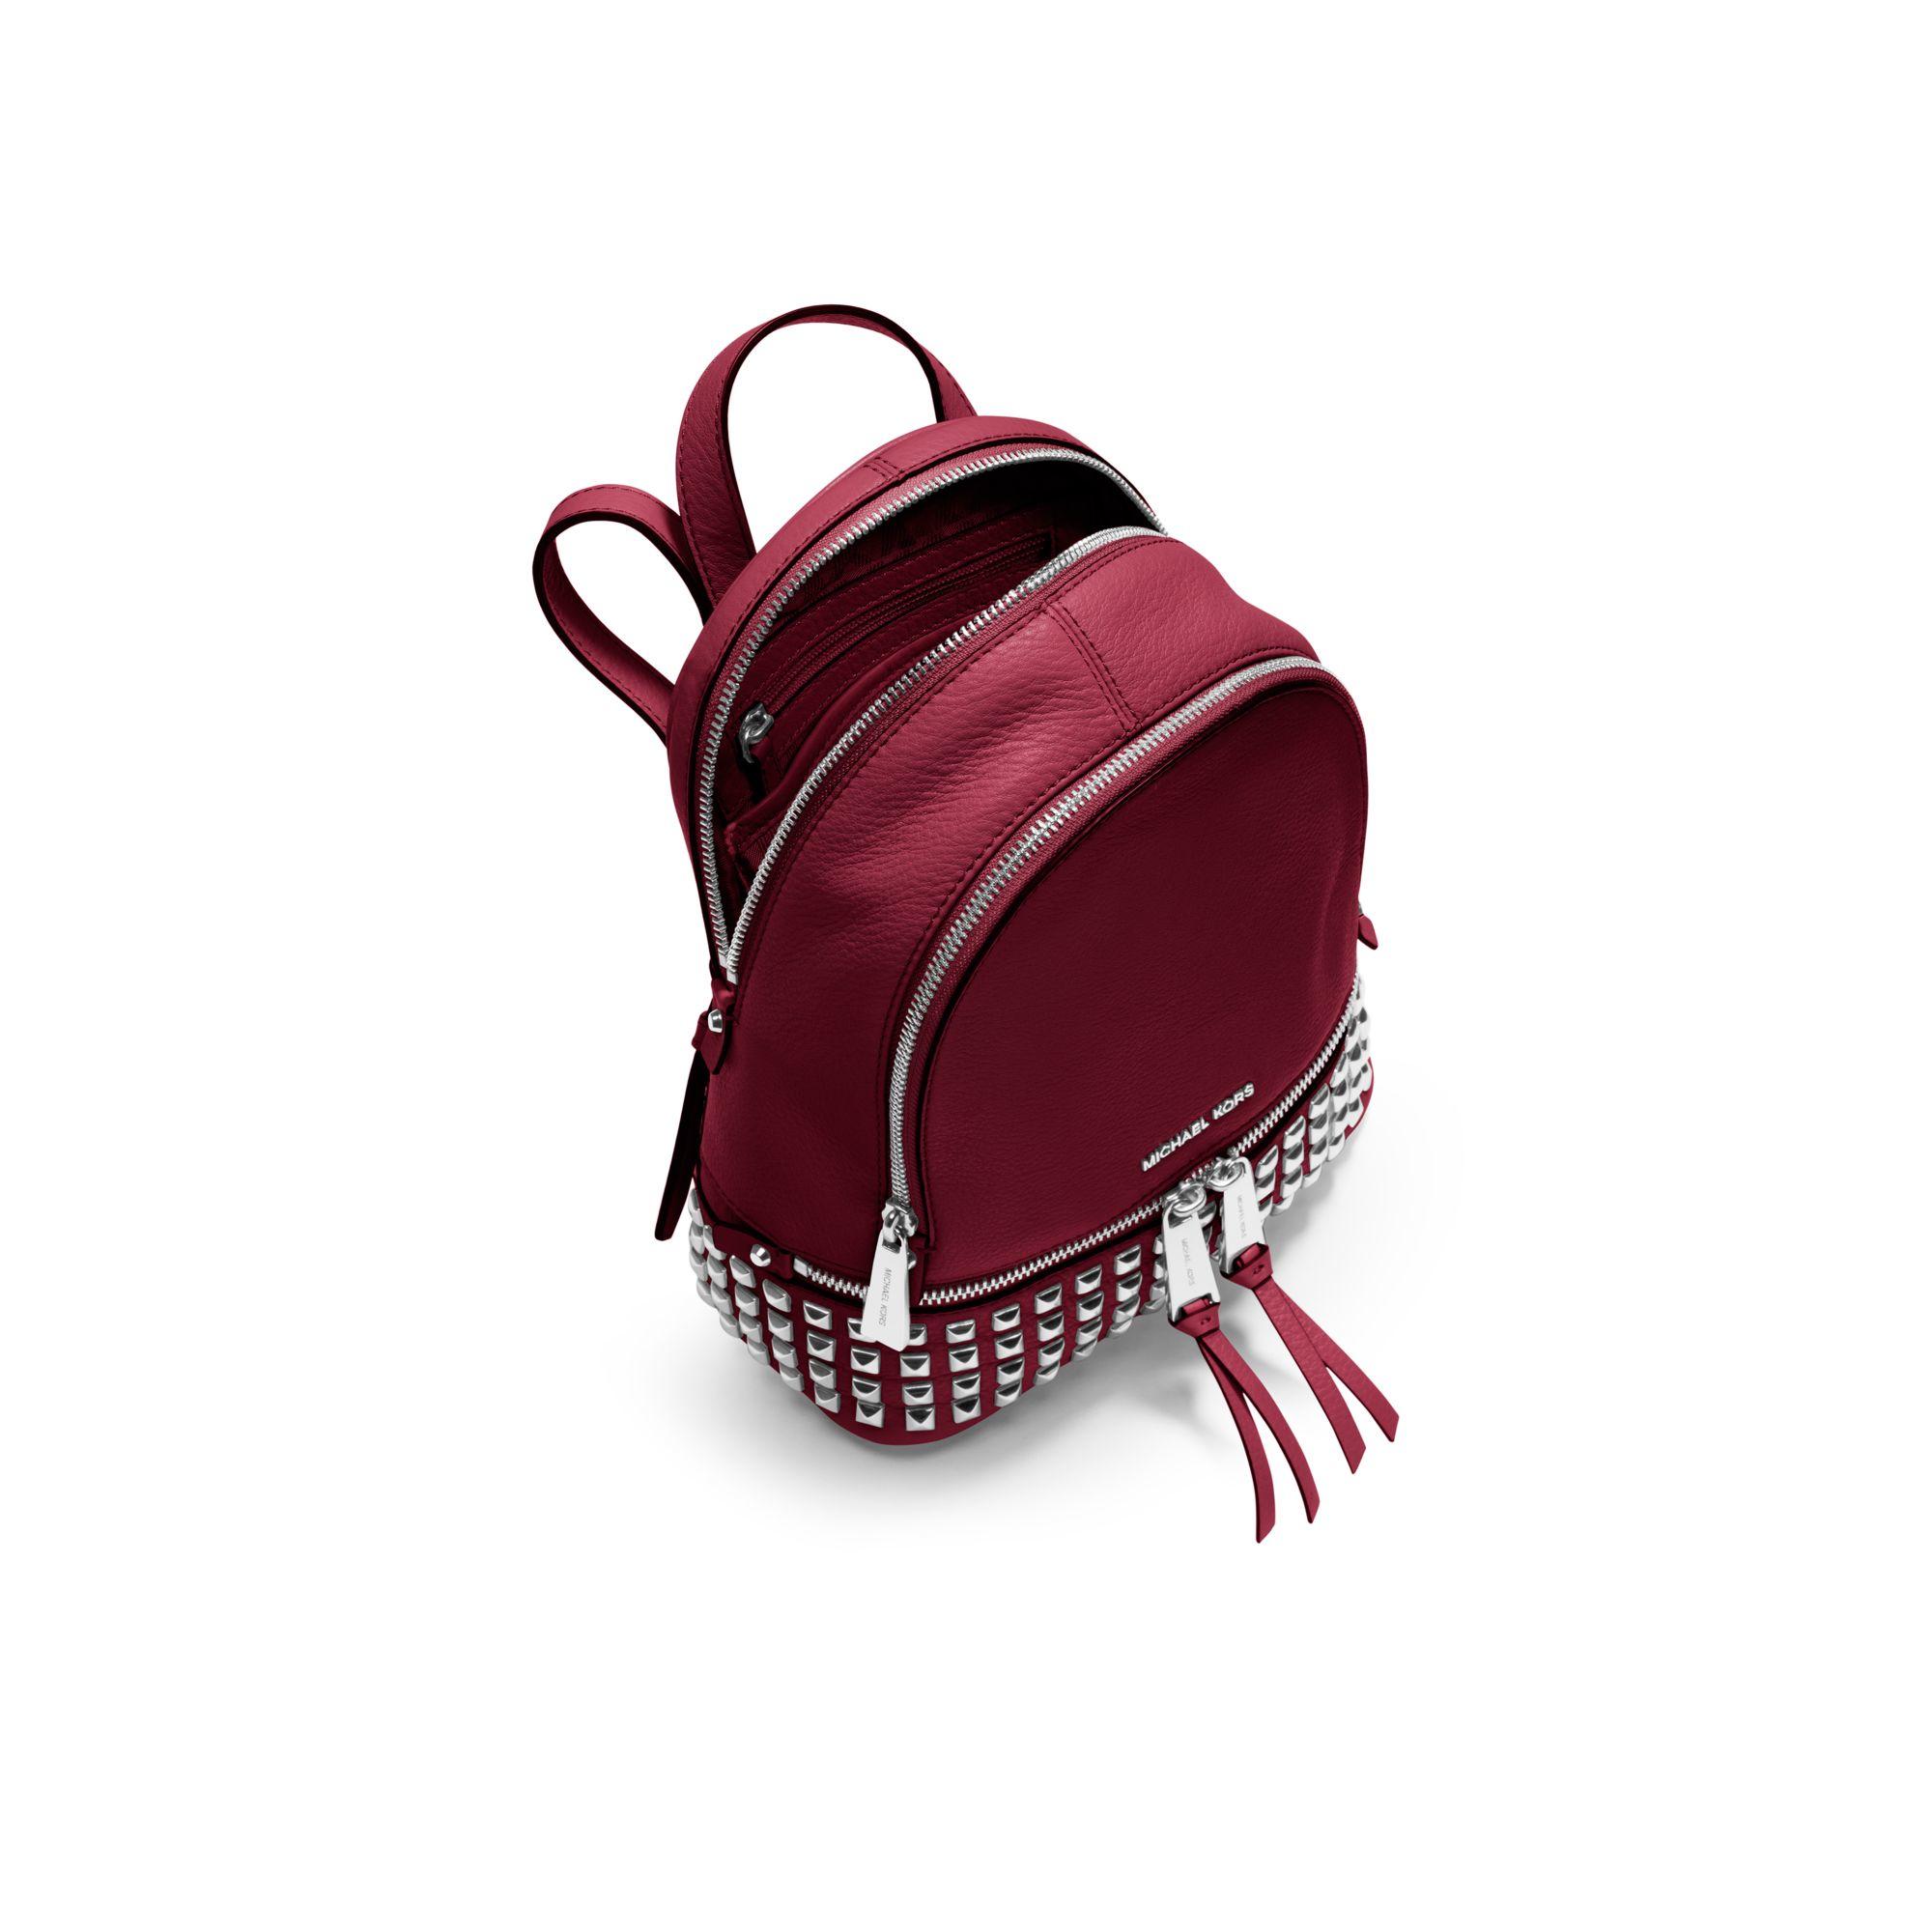 0e4e74a50e01 inexpensive rhea mini perforated leather backpack michael kors b1095 f13fb;  canada michael kors rhea small leather backpack red bbdcf 9fde0